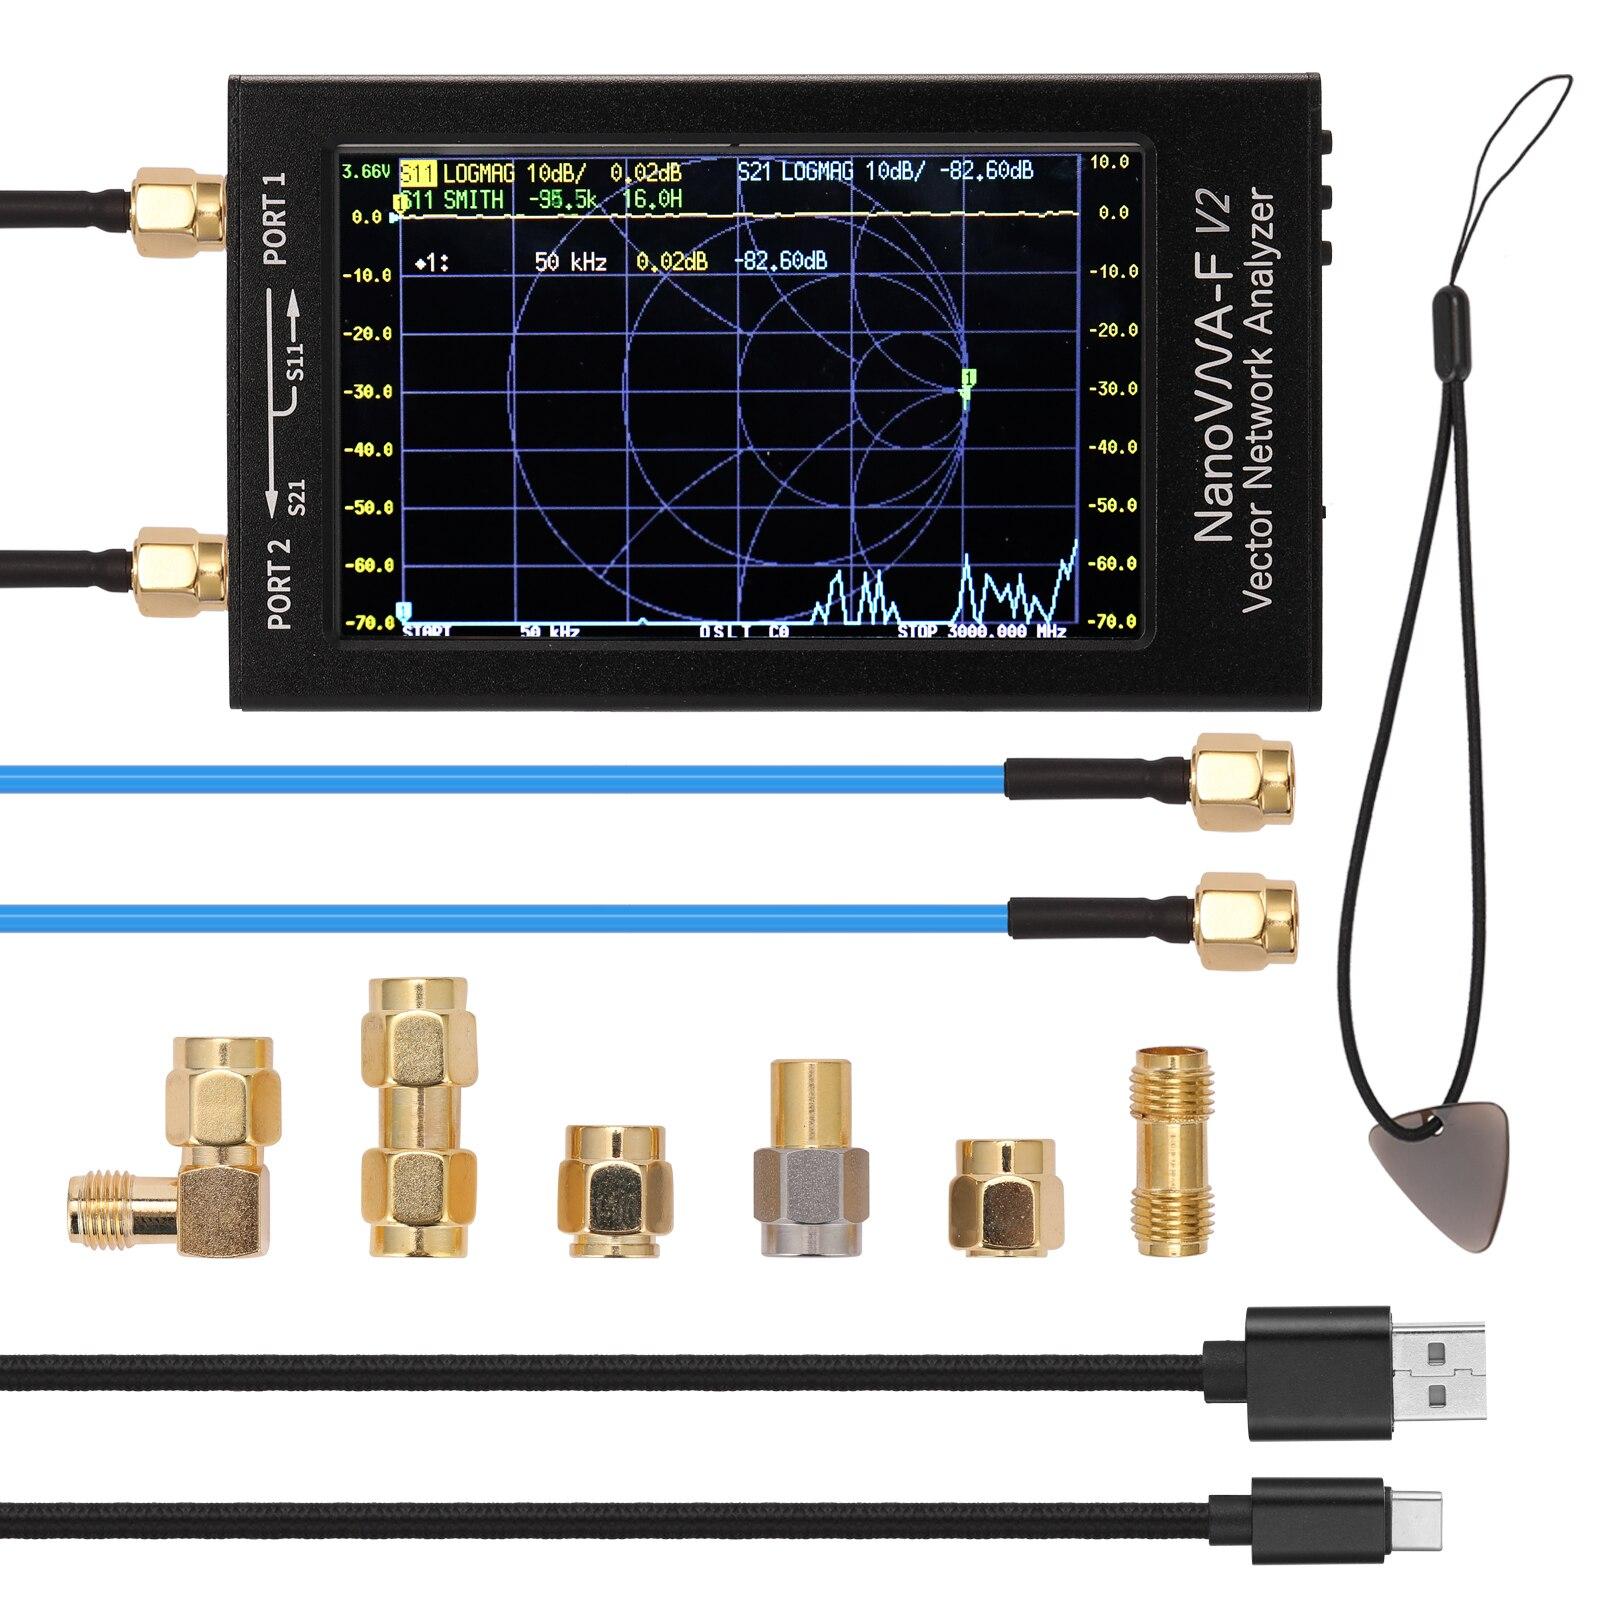 NanoVNA-F V2 4.3 بوصة IPS شاشة الكريستال السائل ناقلات شبكة محلل S-A-A-2 هوائي محلل موجة قصيرة HF VHF UHF 50 كيلو هرتز-3 جيجا هرتز